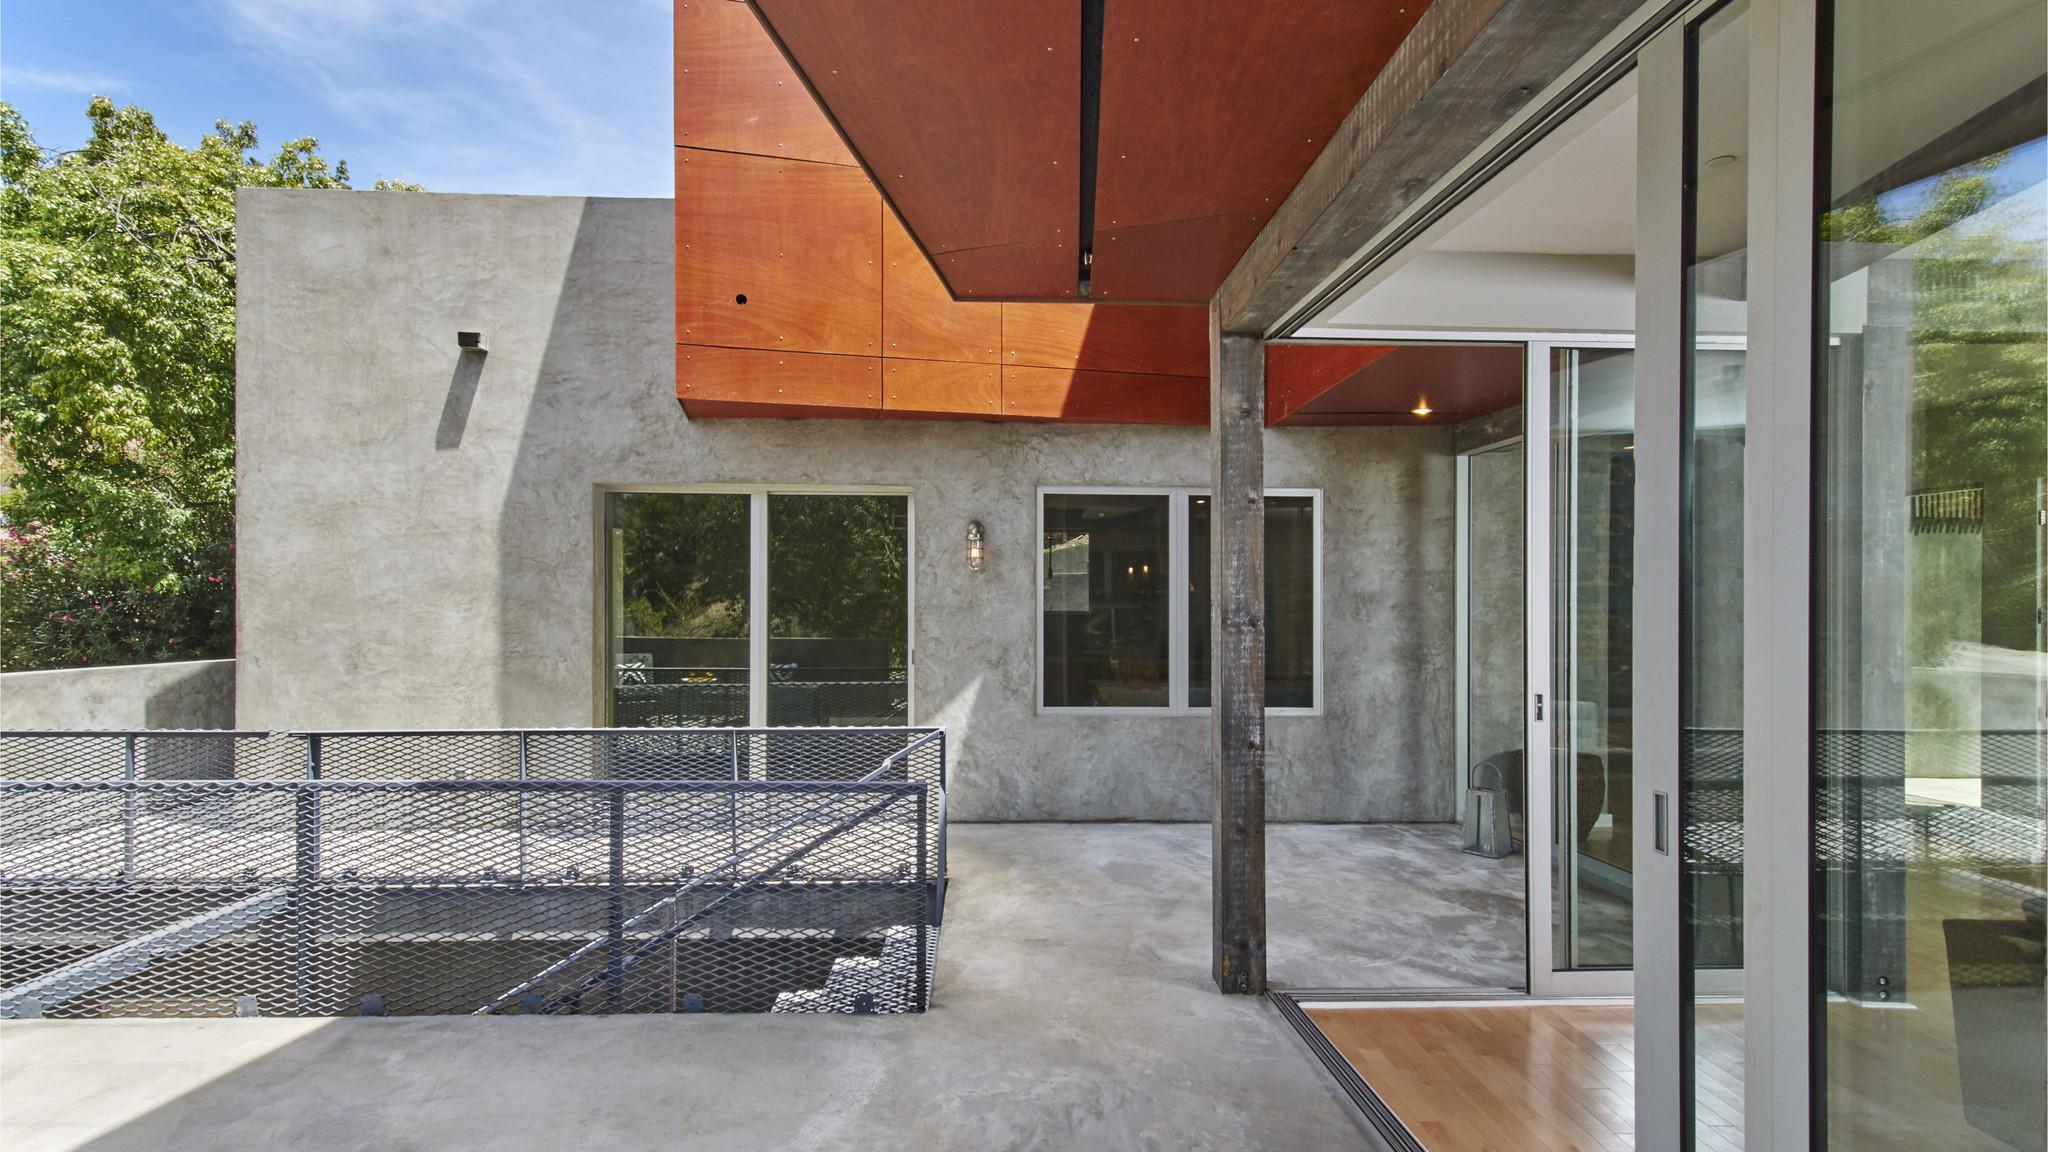 http   www.latimes.com home la-hm-college-amenities-pg-20150717 ... 7beb53d39